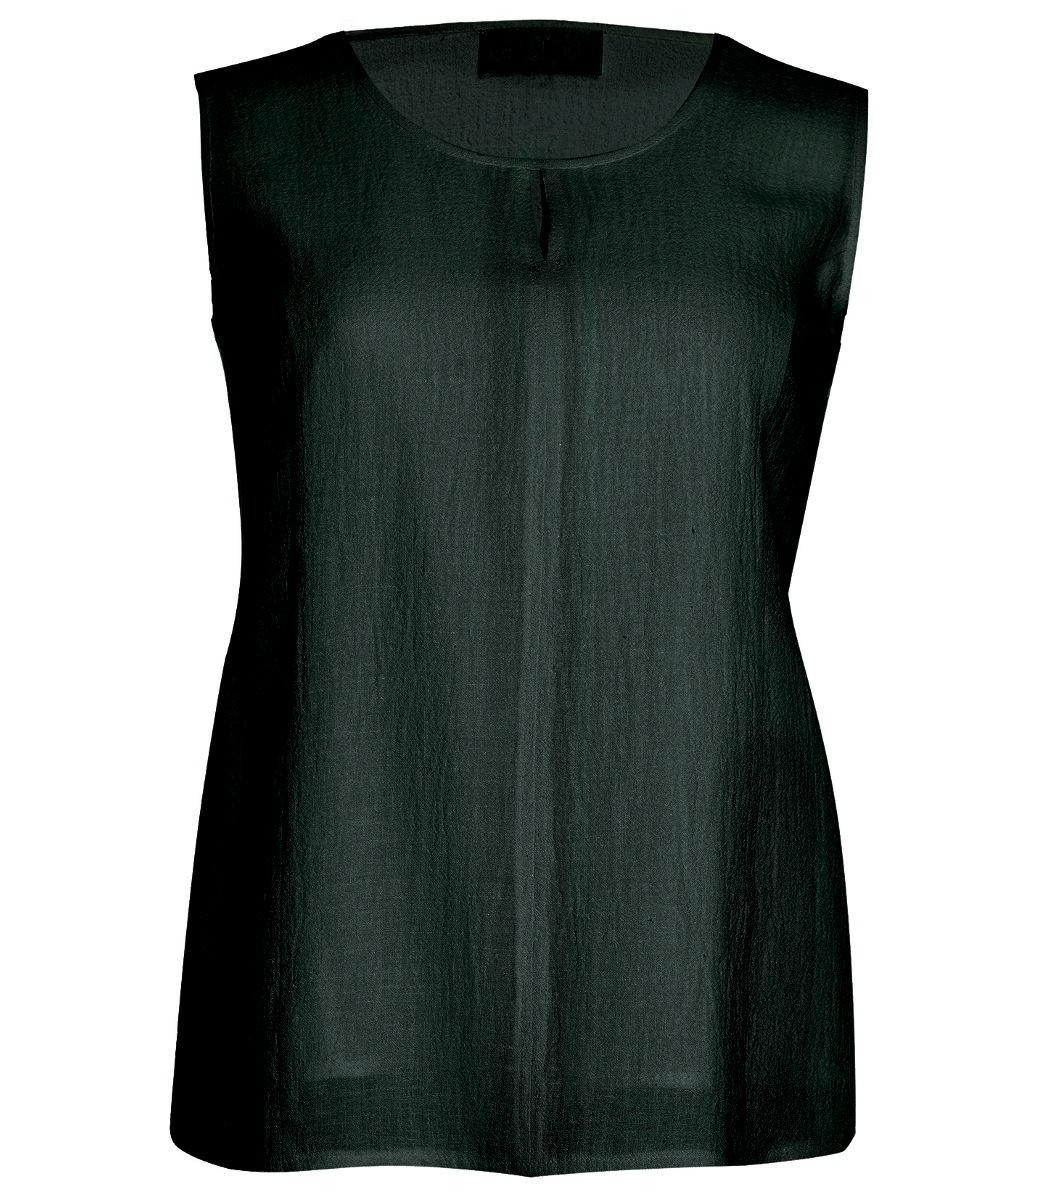 chalou damen leinen tr ger top in schwarz gro e gr en. Black Bedroom Furniture Sets. Home Design Ideas